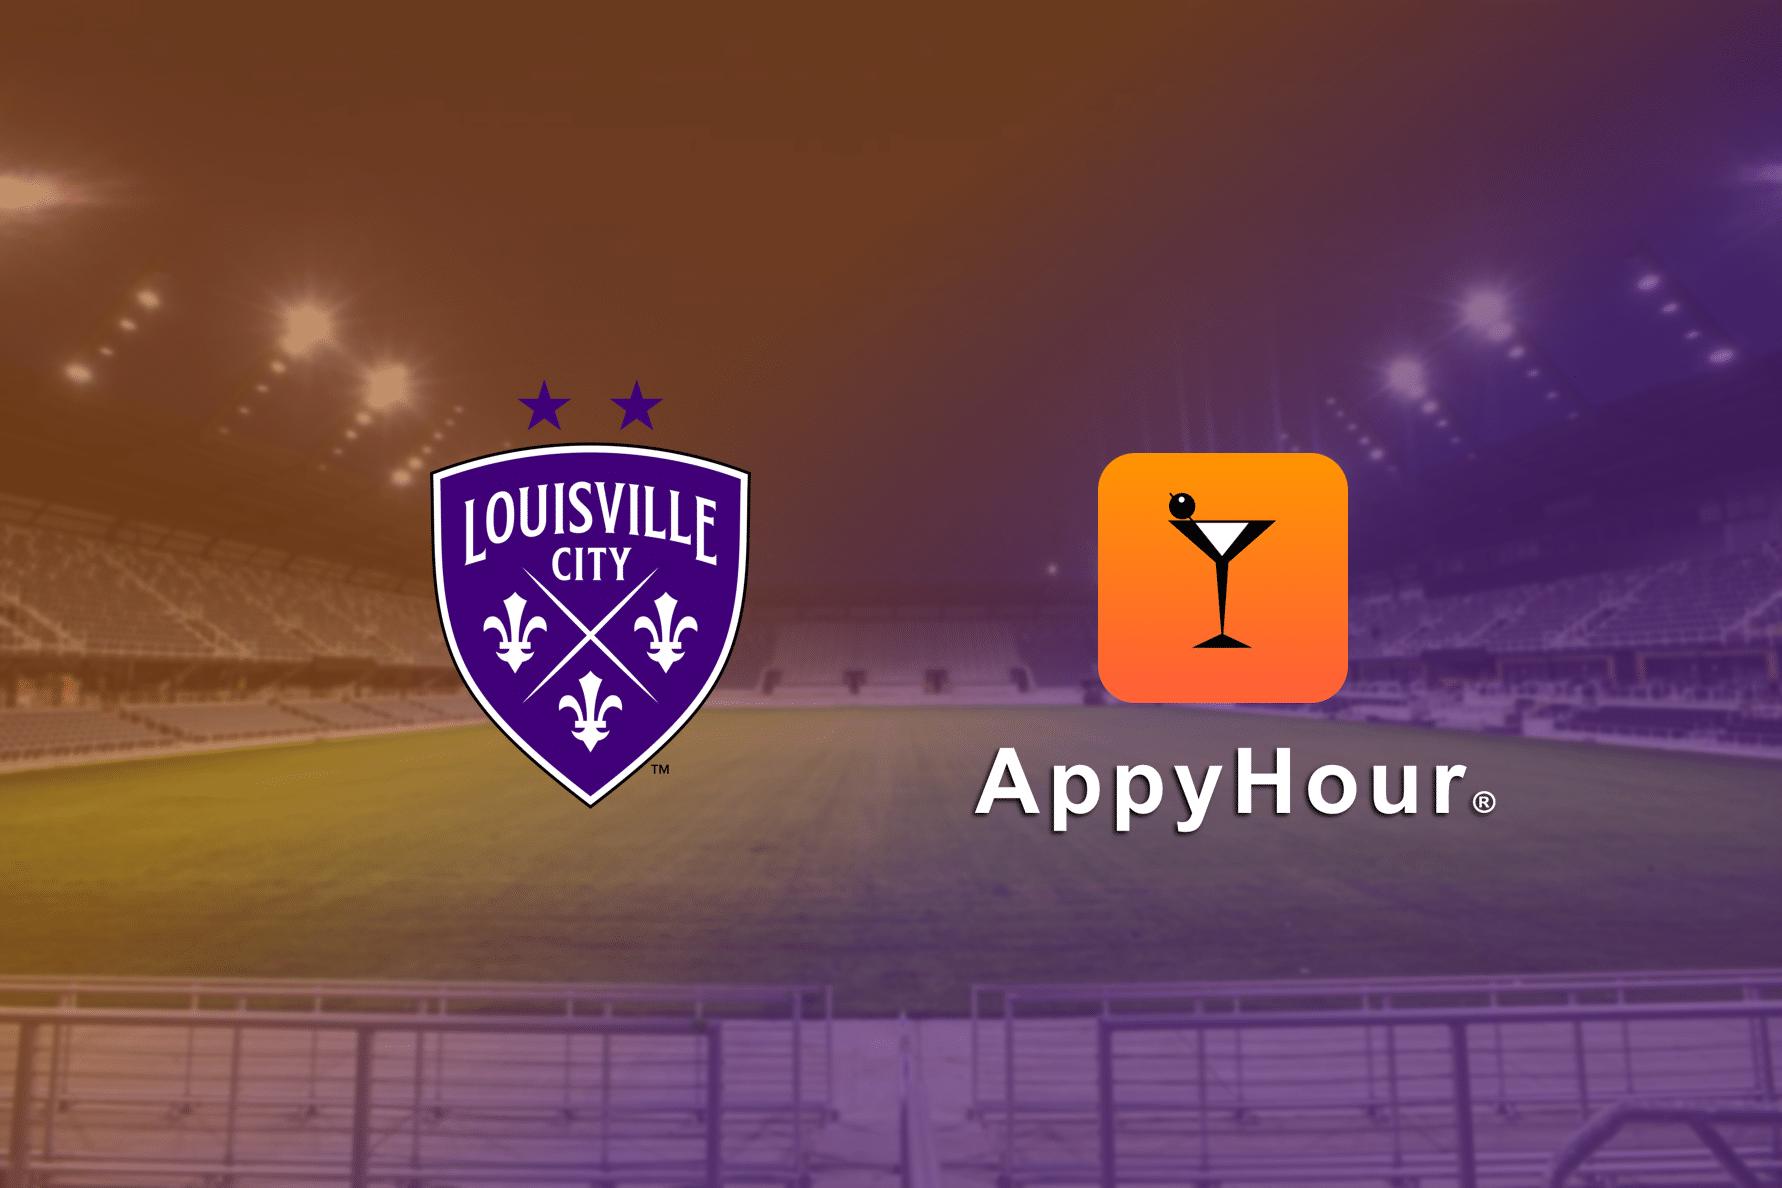 AppyHour Announces Partnership with Louisville City FC